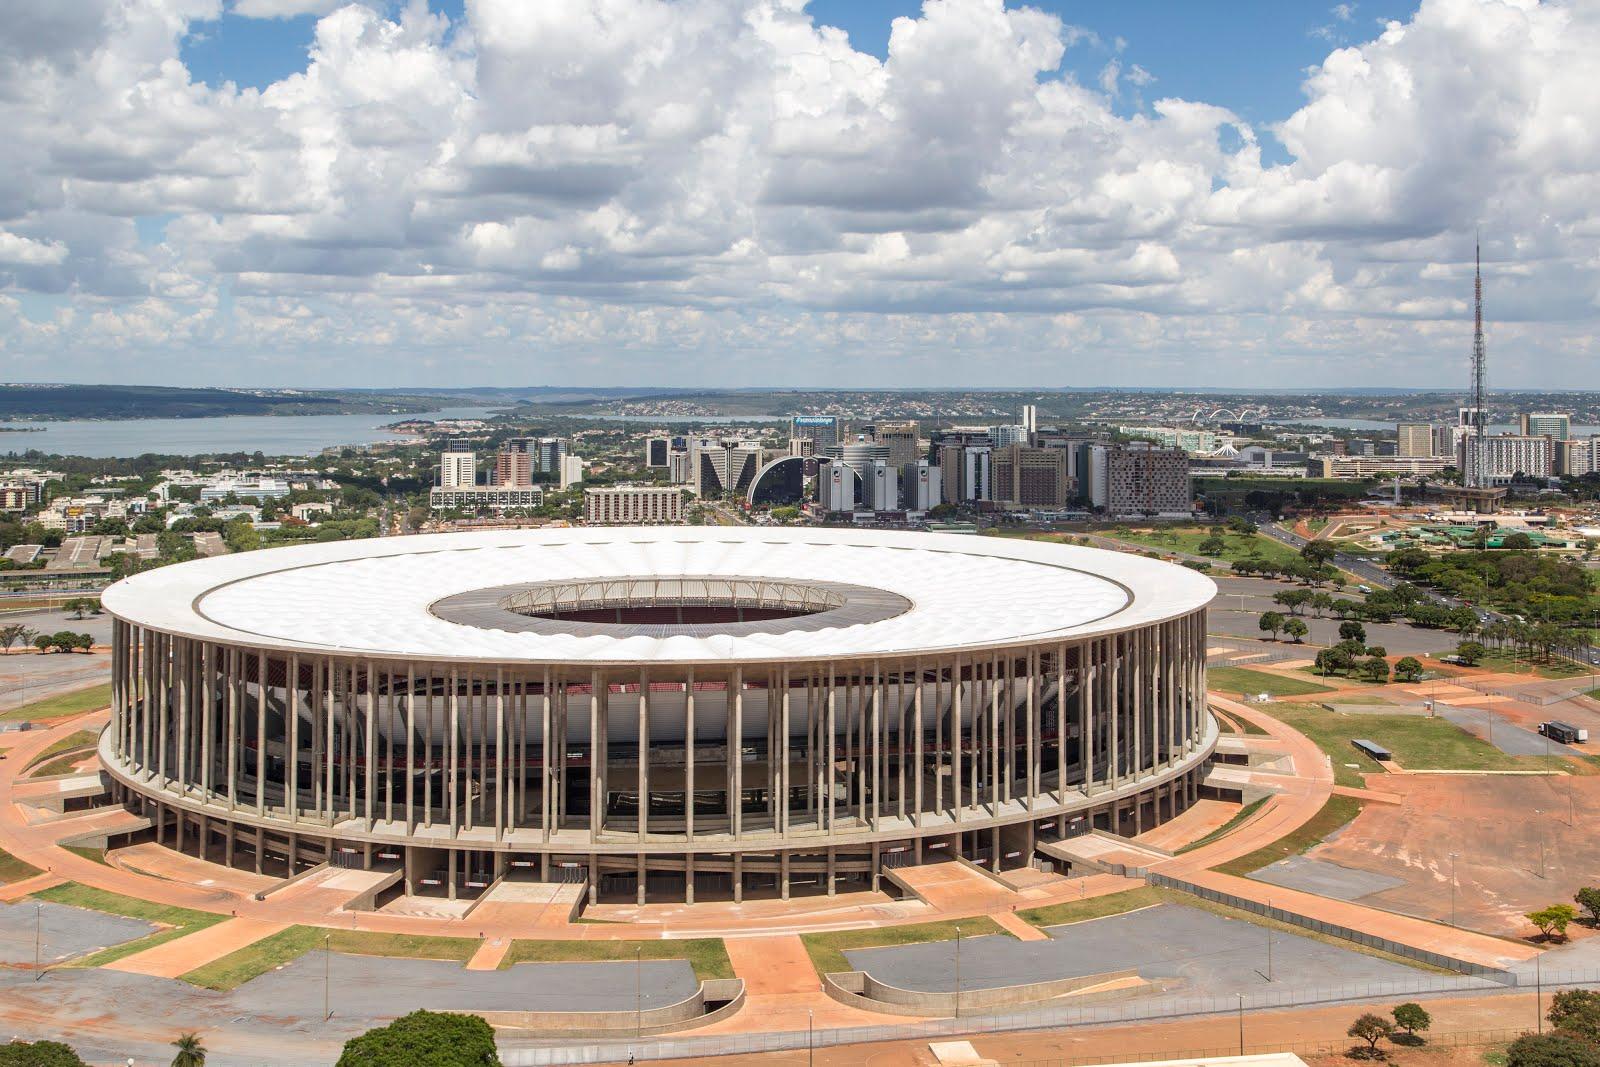 Estádio Nacional Mané Garrincha